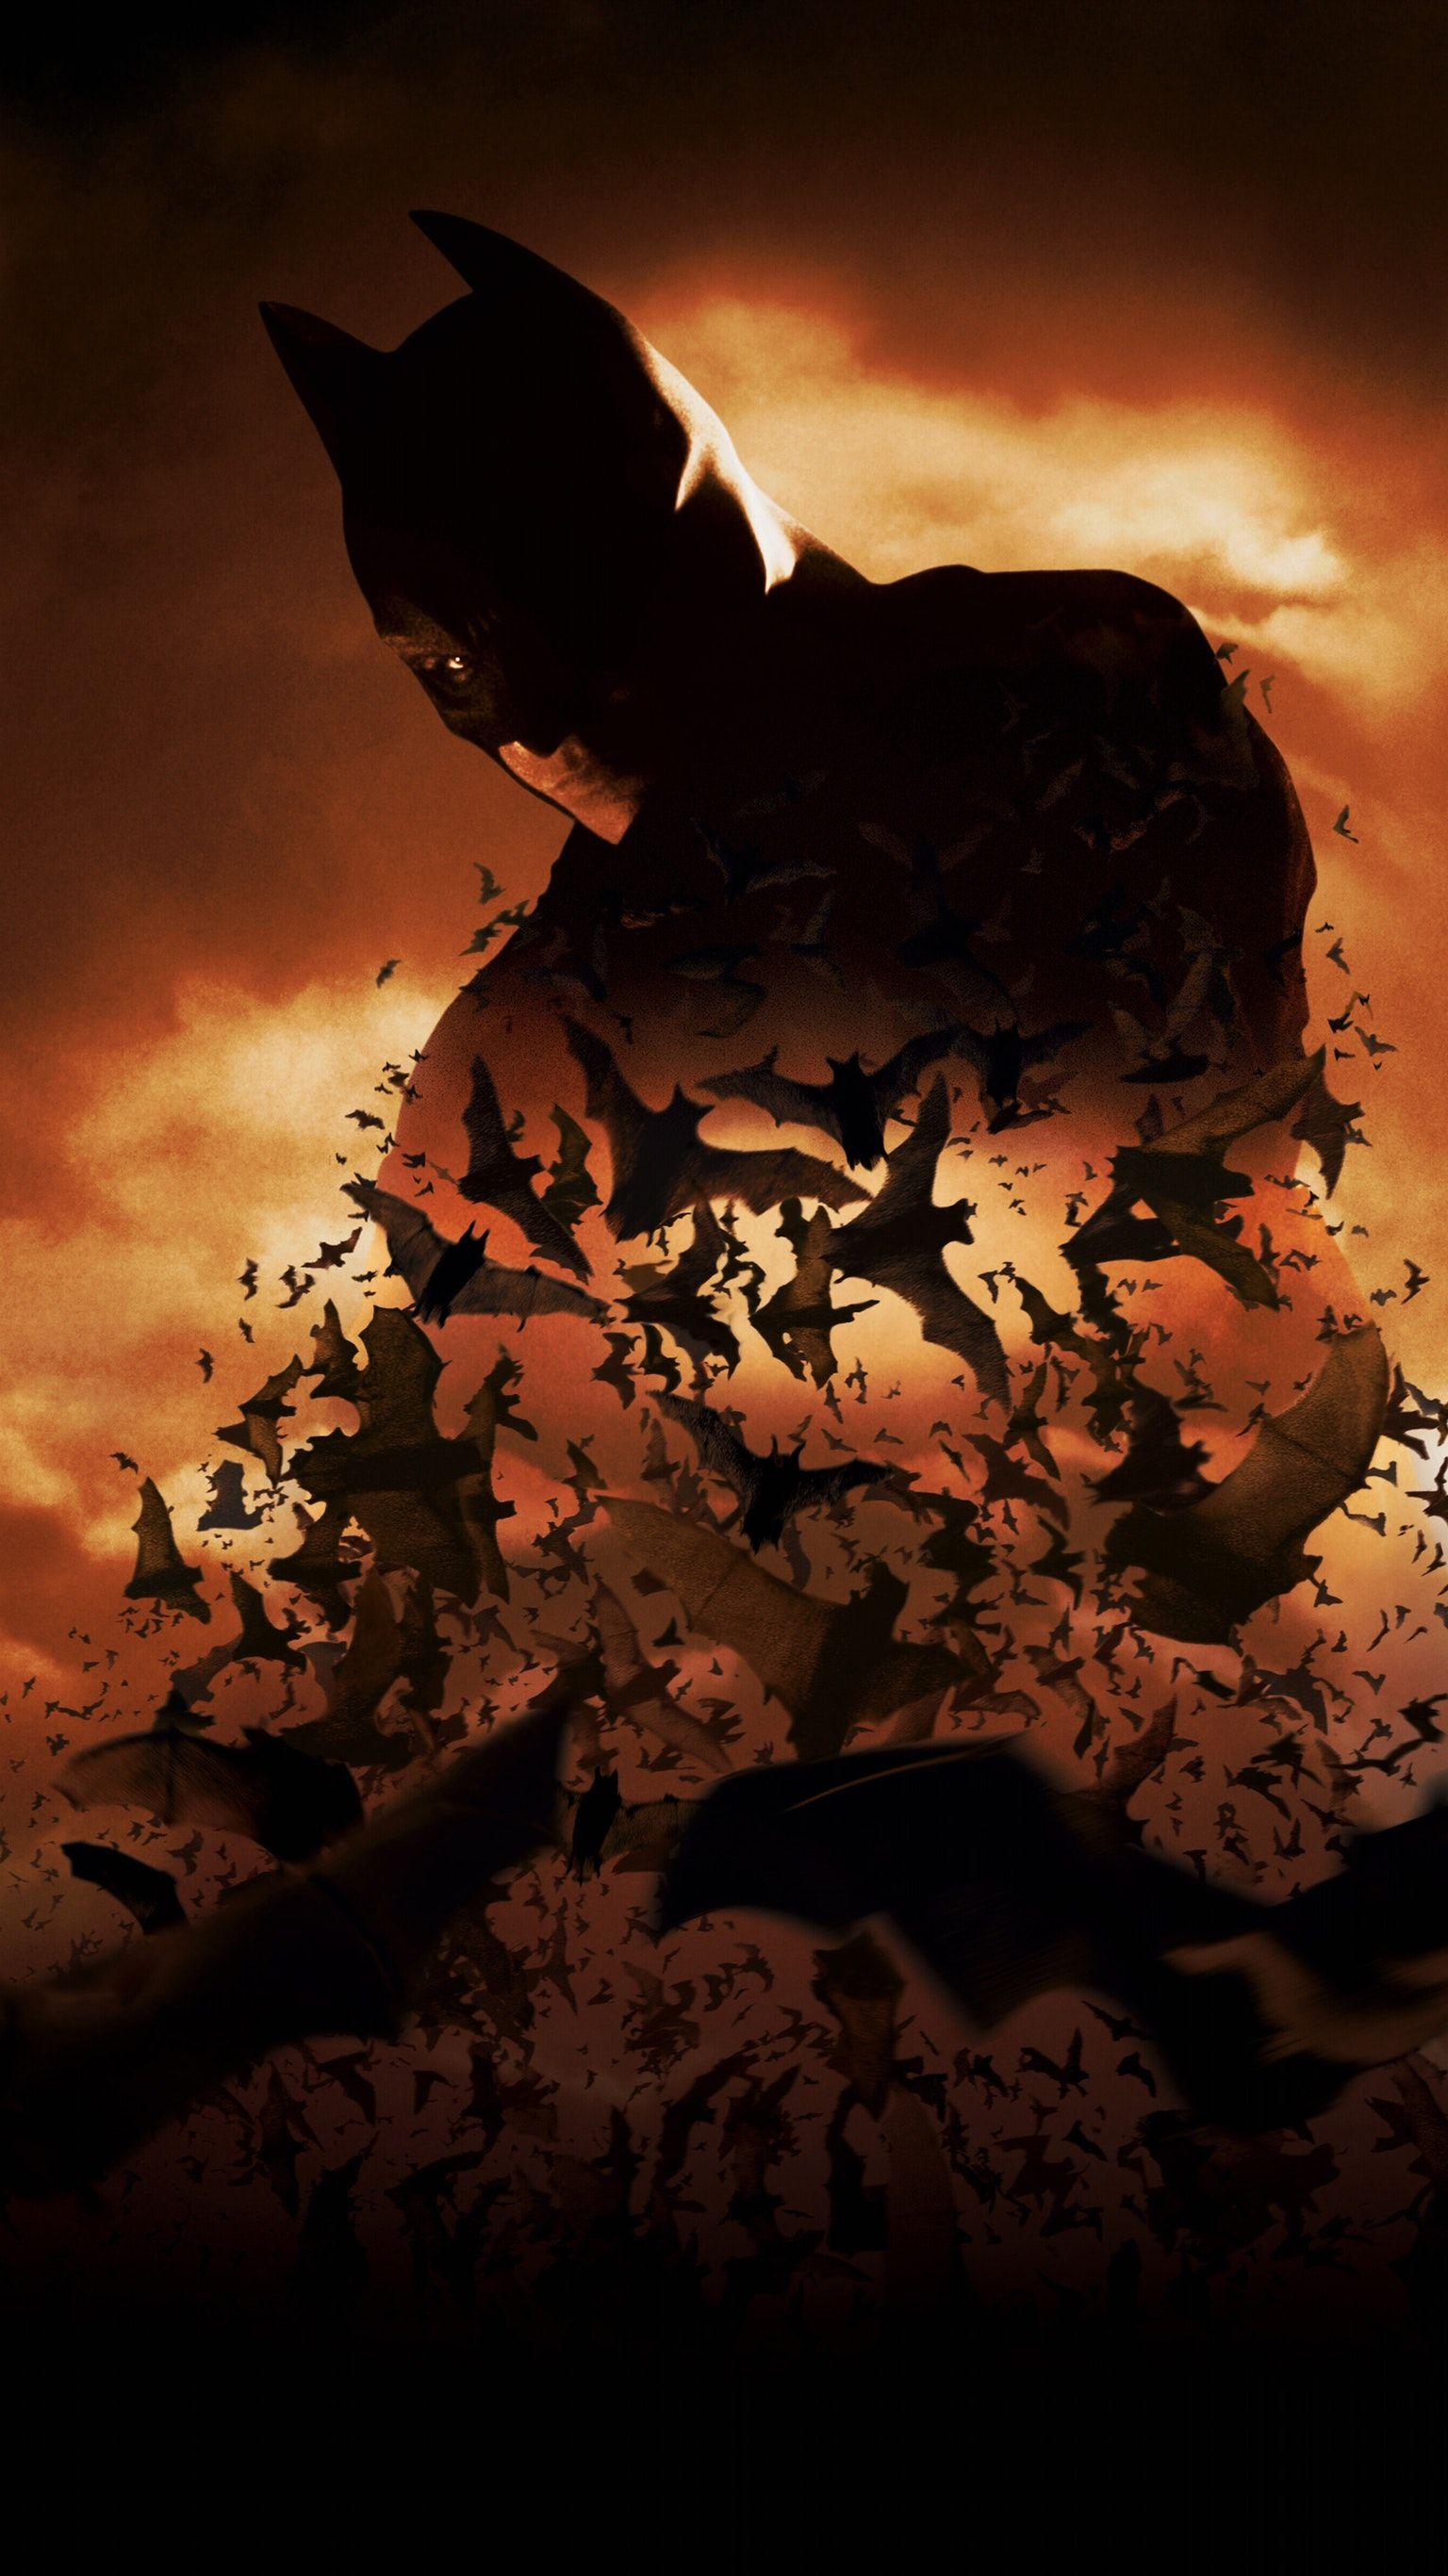 batman begins (2005) phone wallpaper | batman, movie wallpapers and